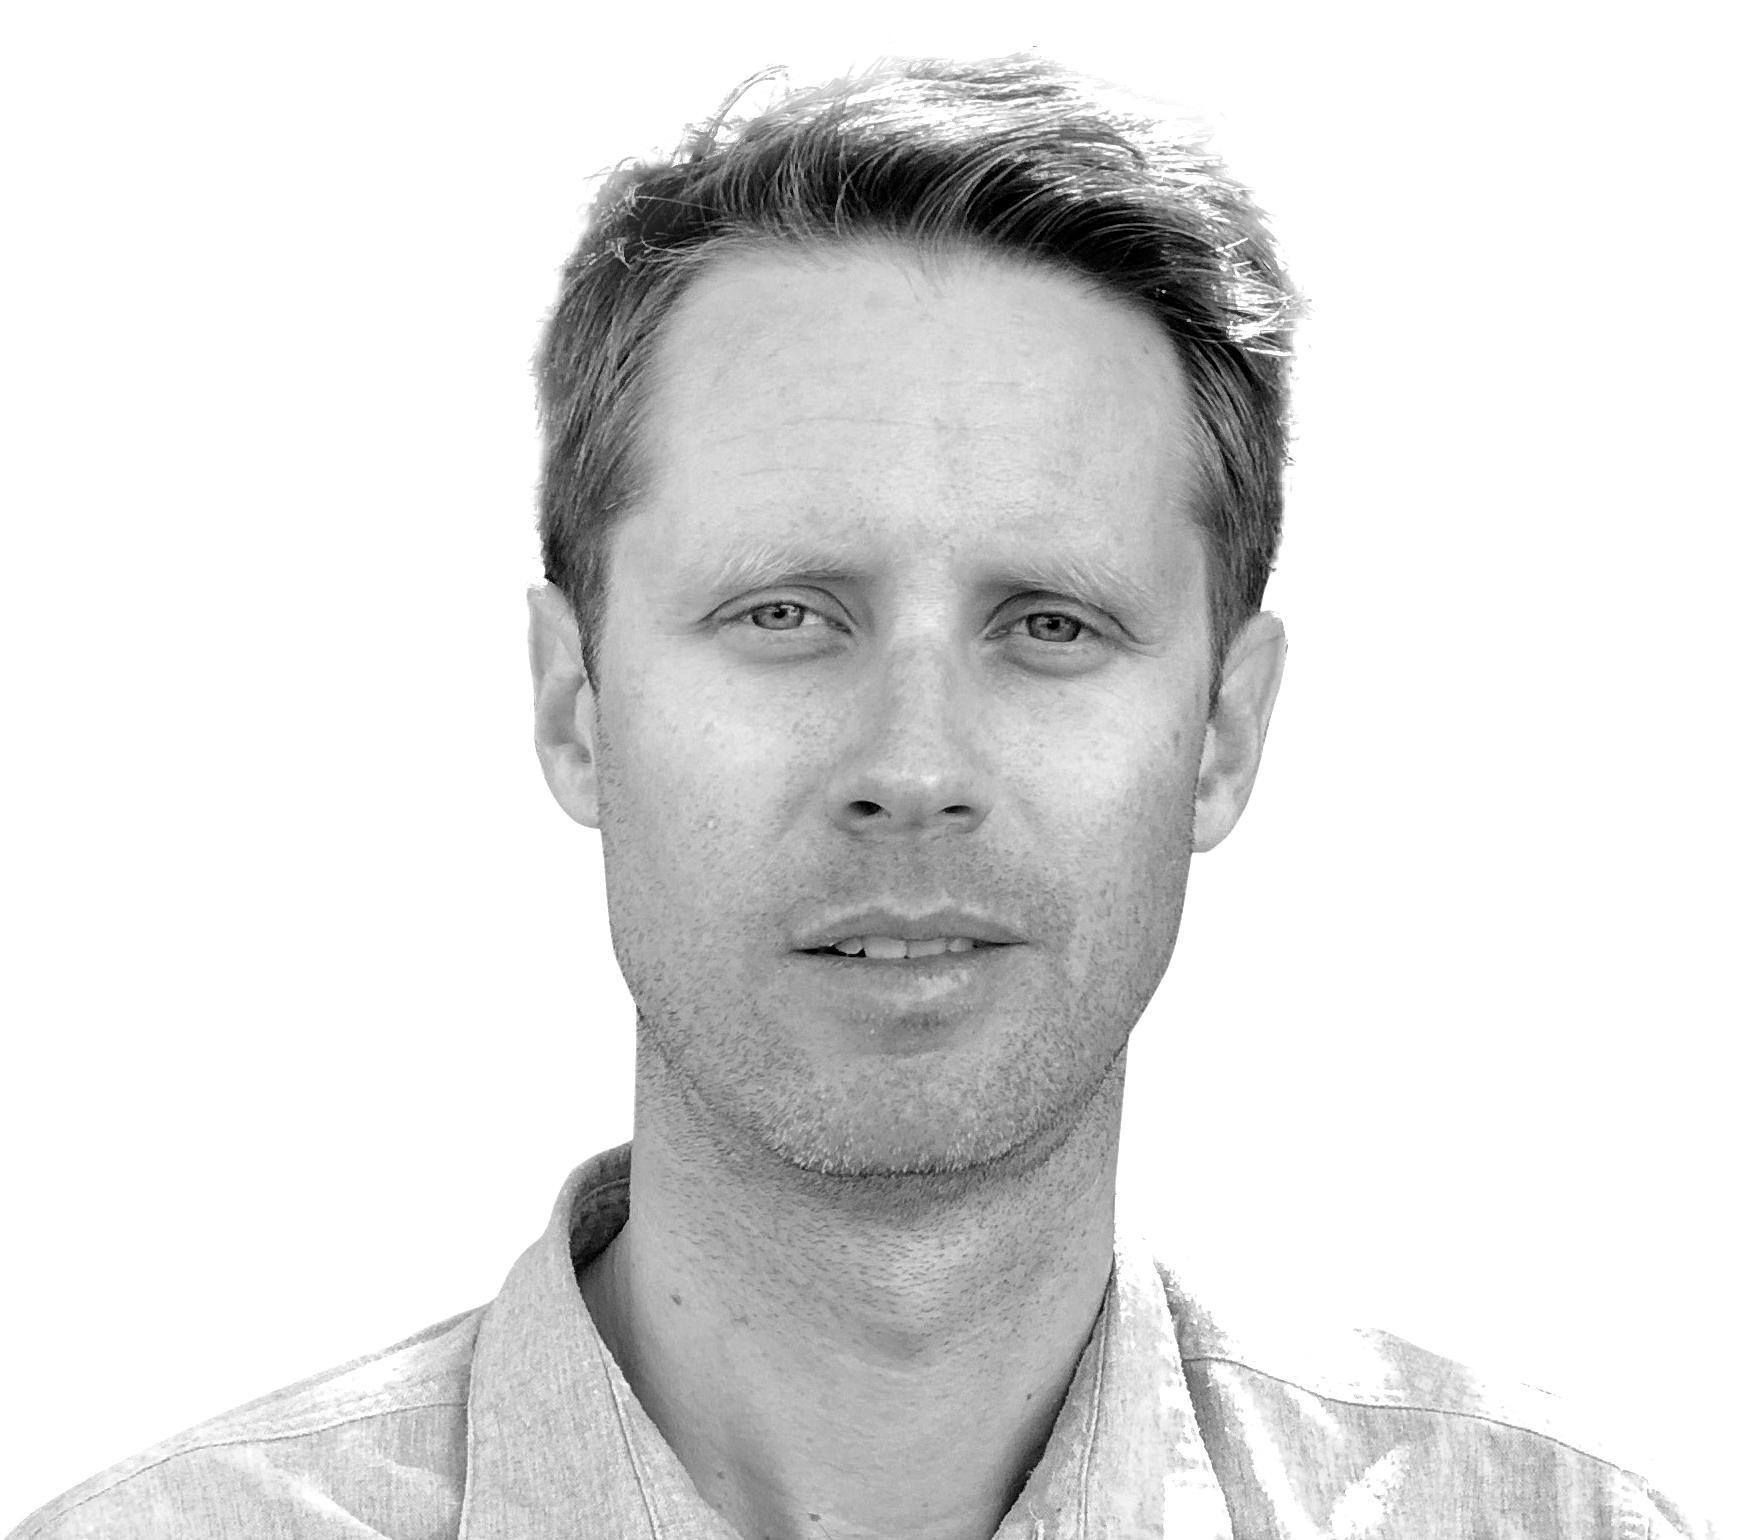 David C. Vogt